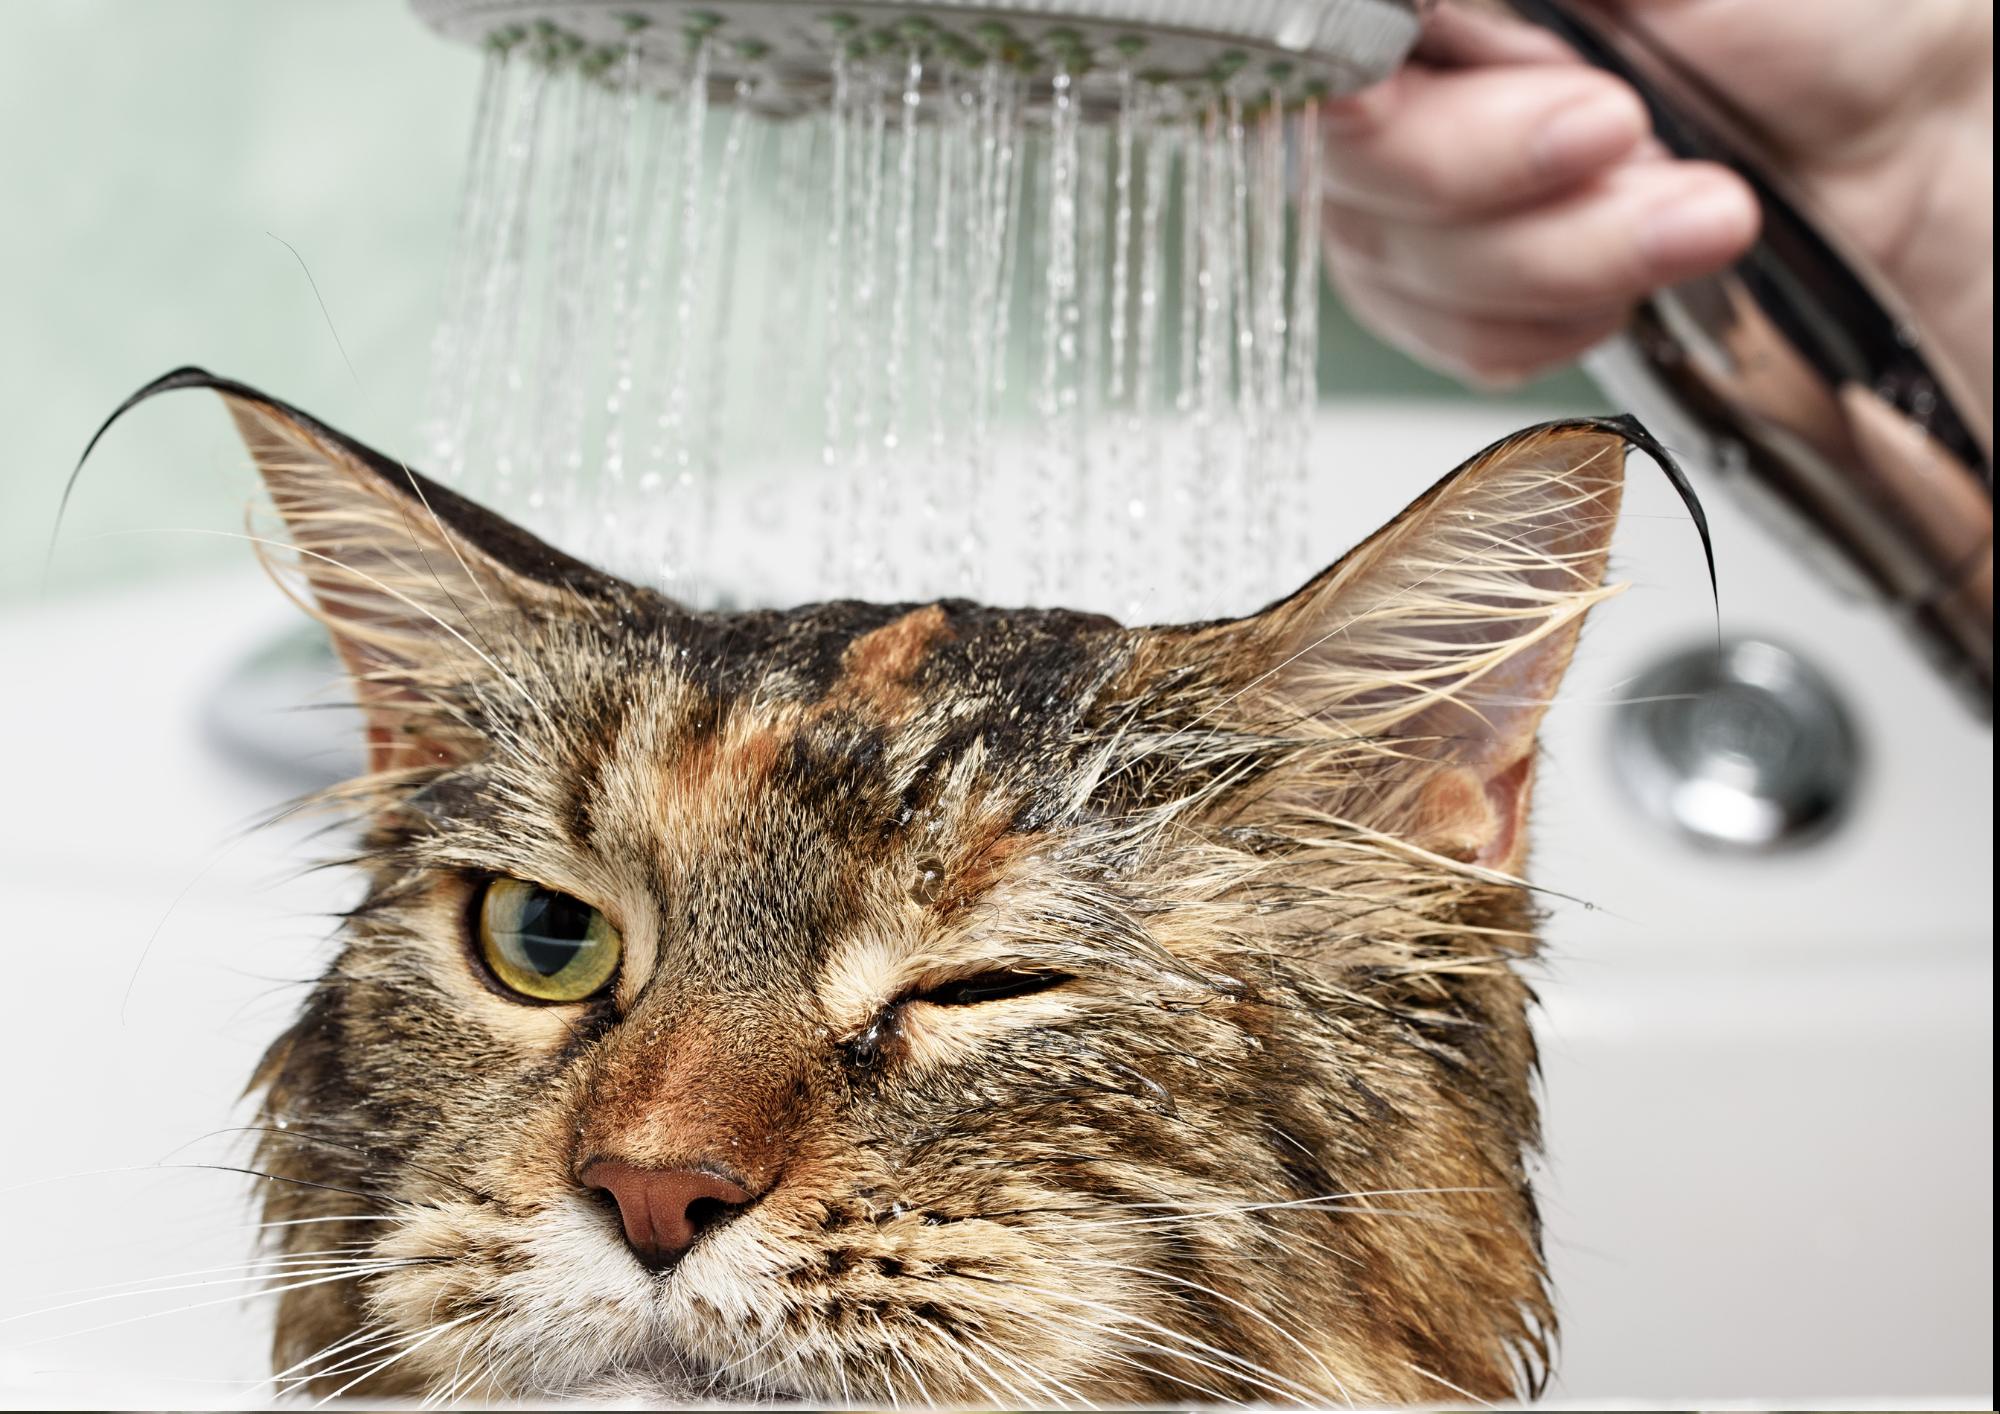 f3 vaccination - bathing cat